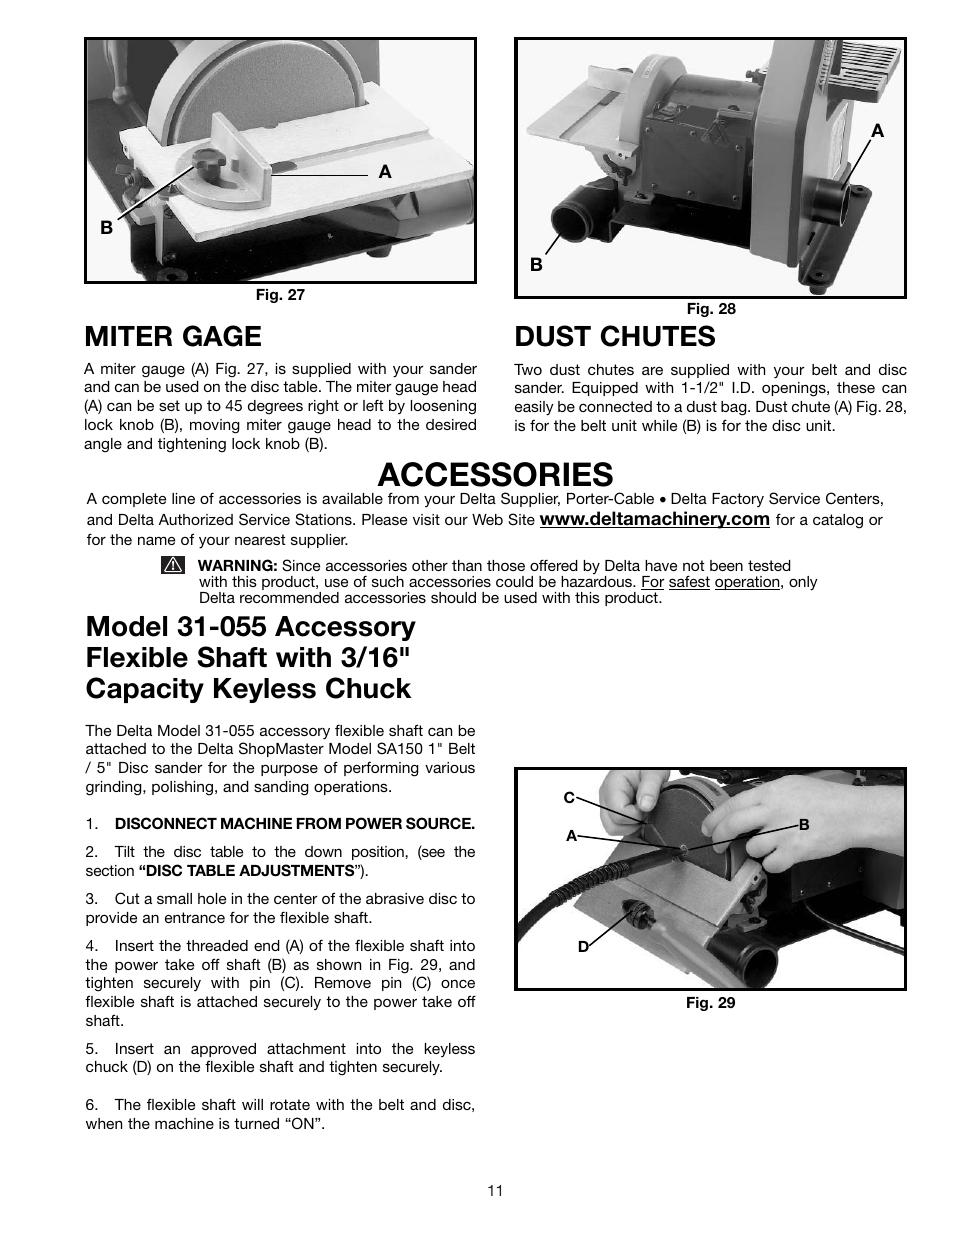 accessories miter gage dust chutes delta sa150 user manual rh manualsdir com